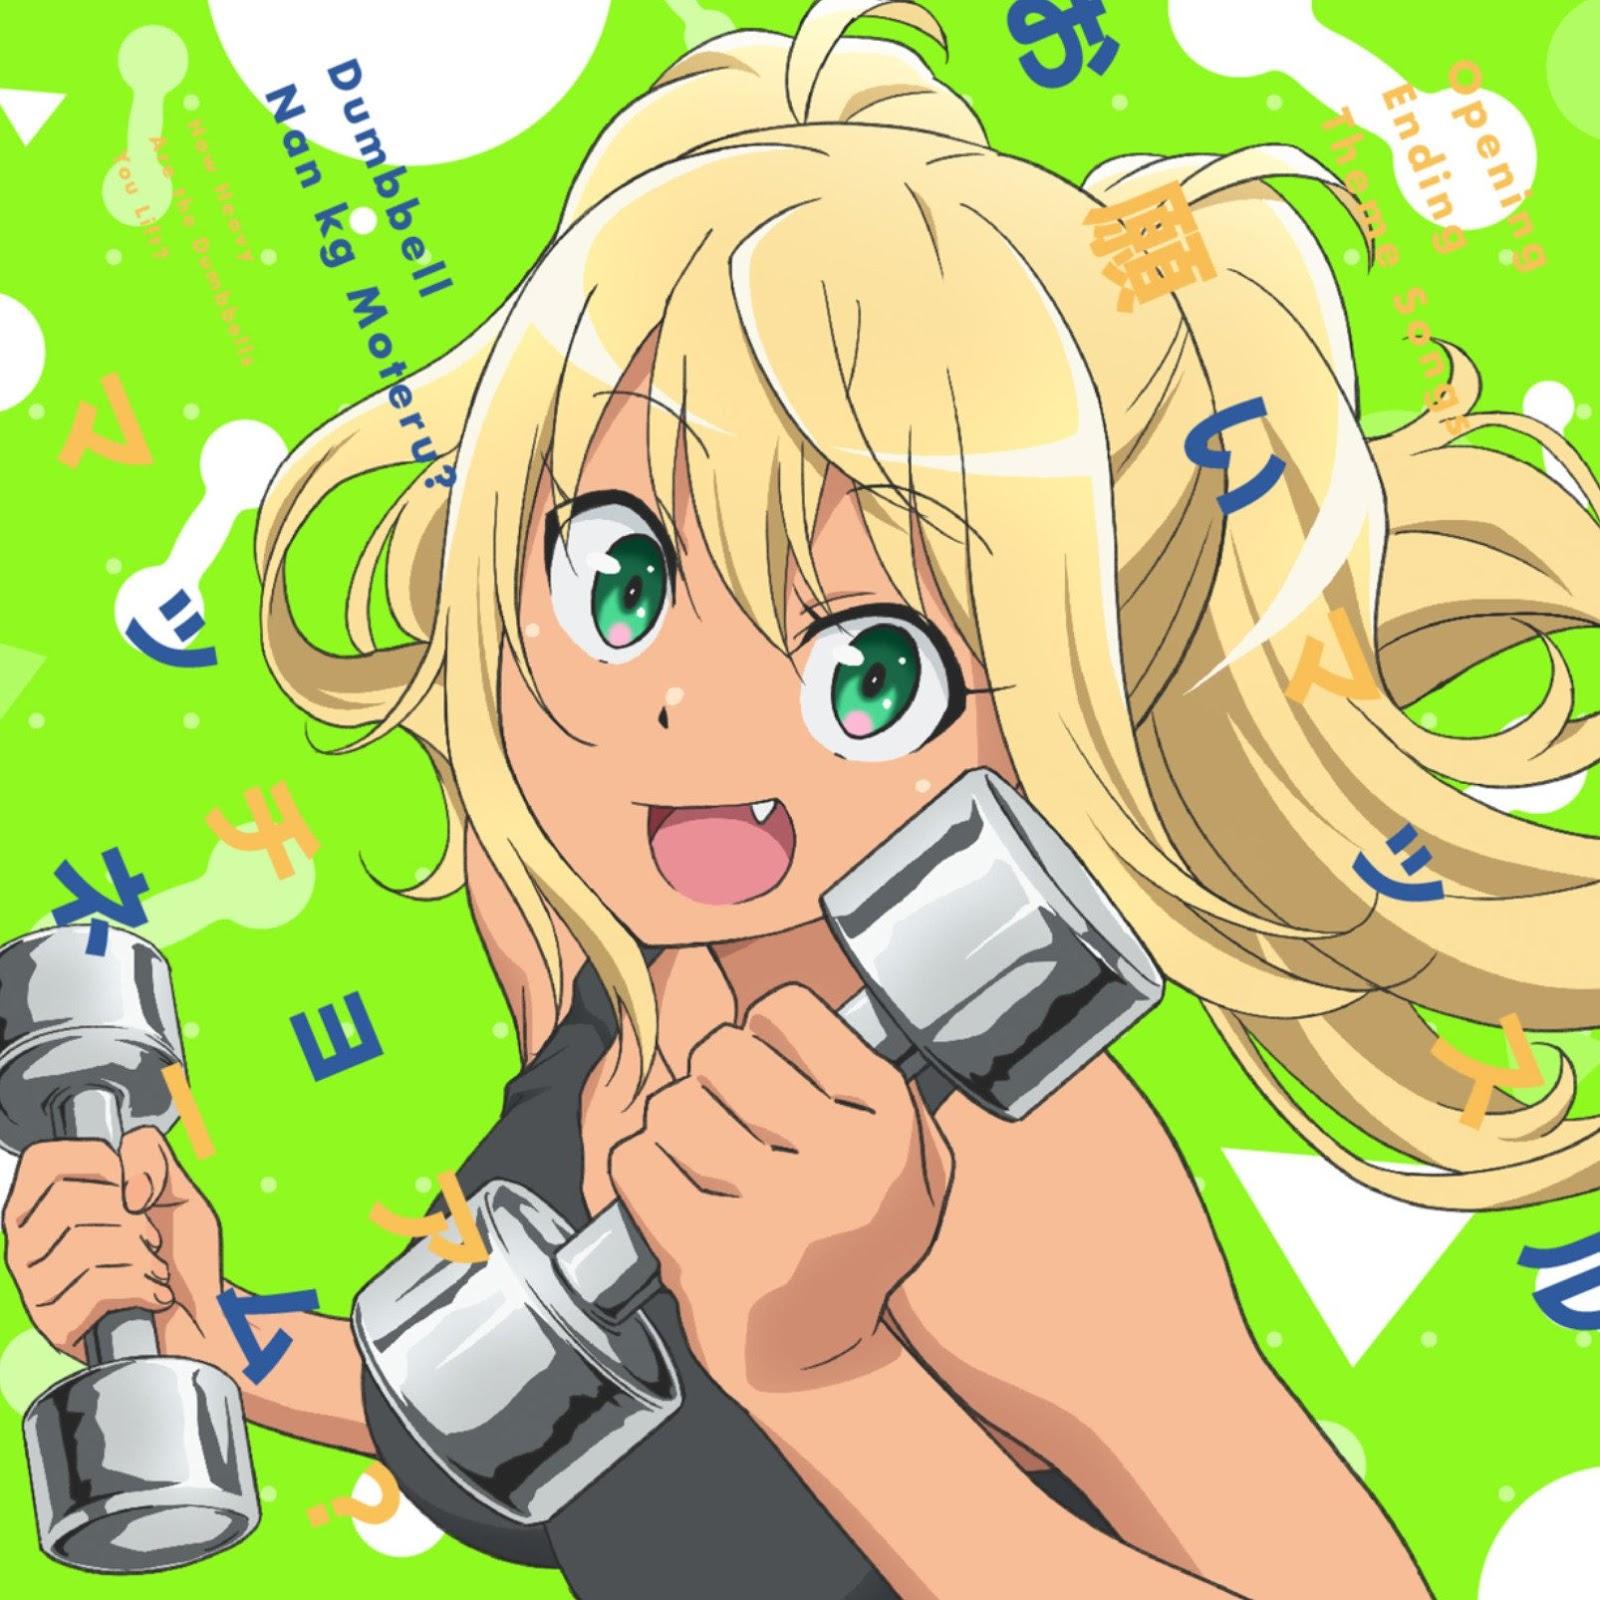 Vinland Saga Ost Mp3 Dowload Anime Wallpaper Hd